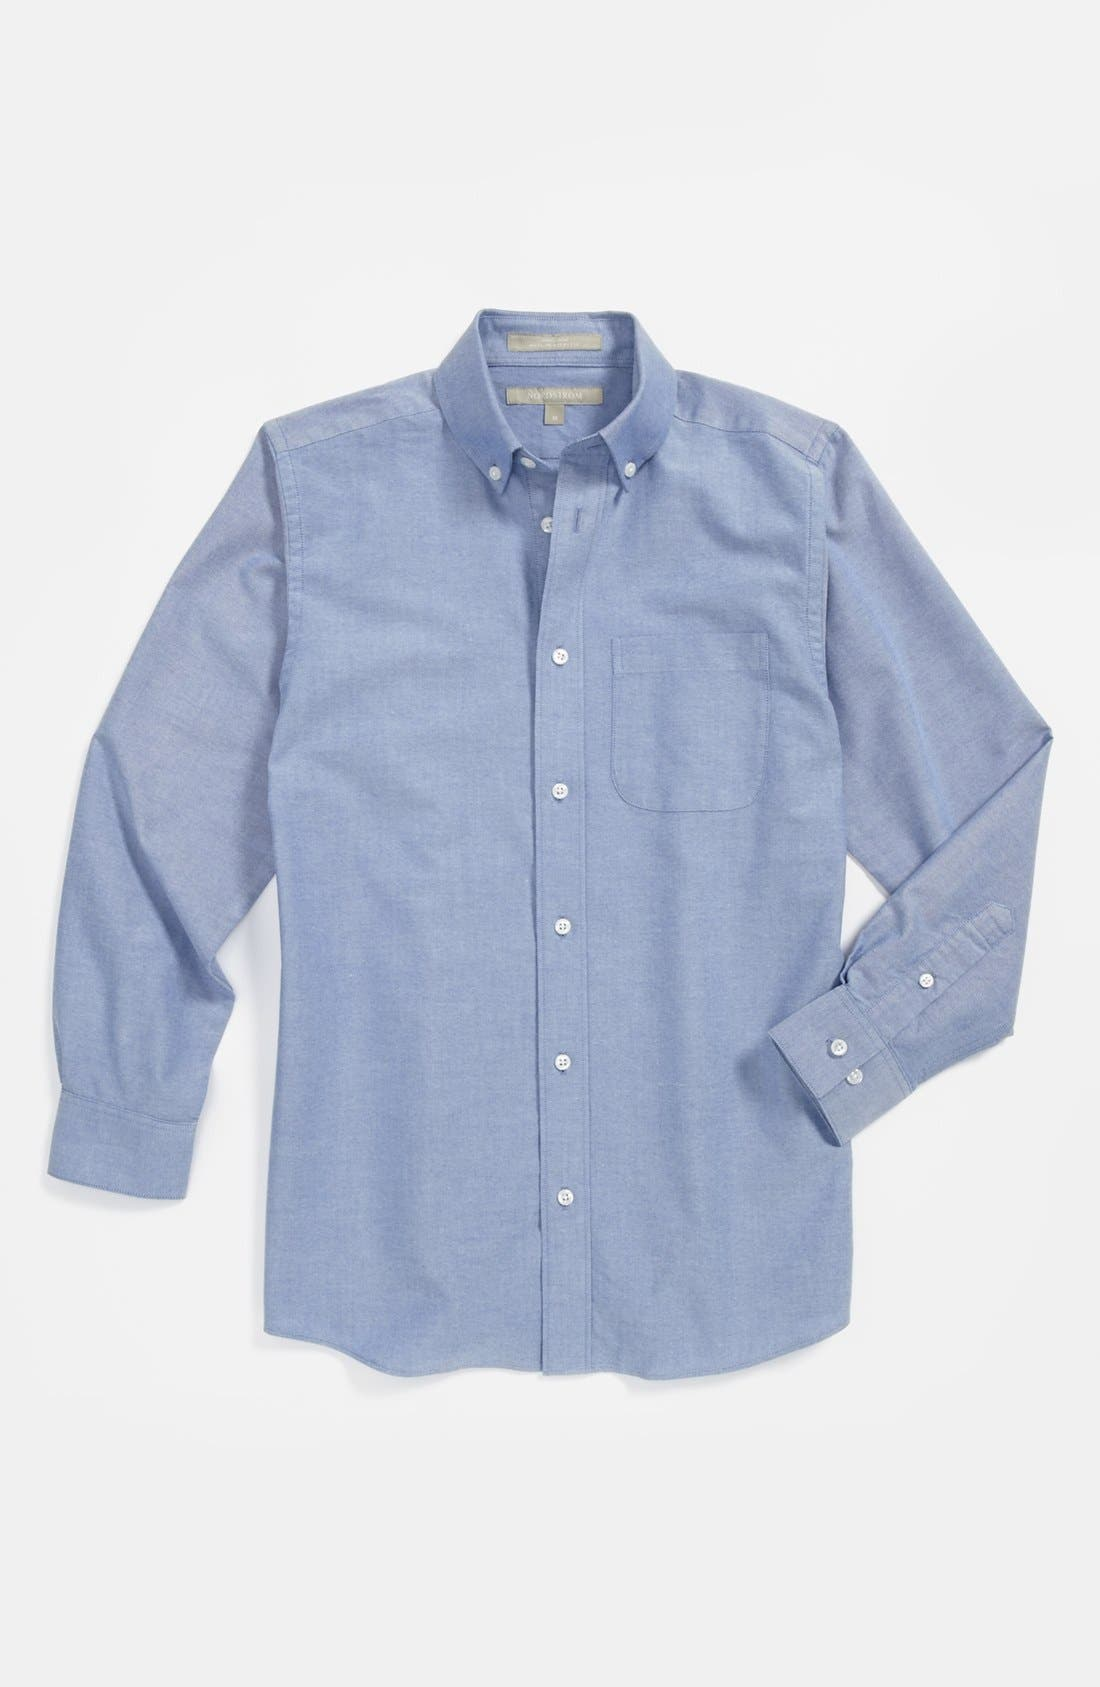 Alternate Image 1 Selected - Nordstrom 'Michael' Woven Oxford Shirt (Little Boys & Big Boys)